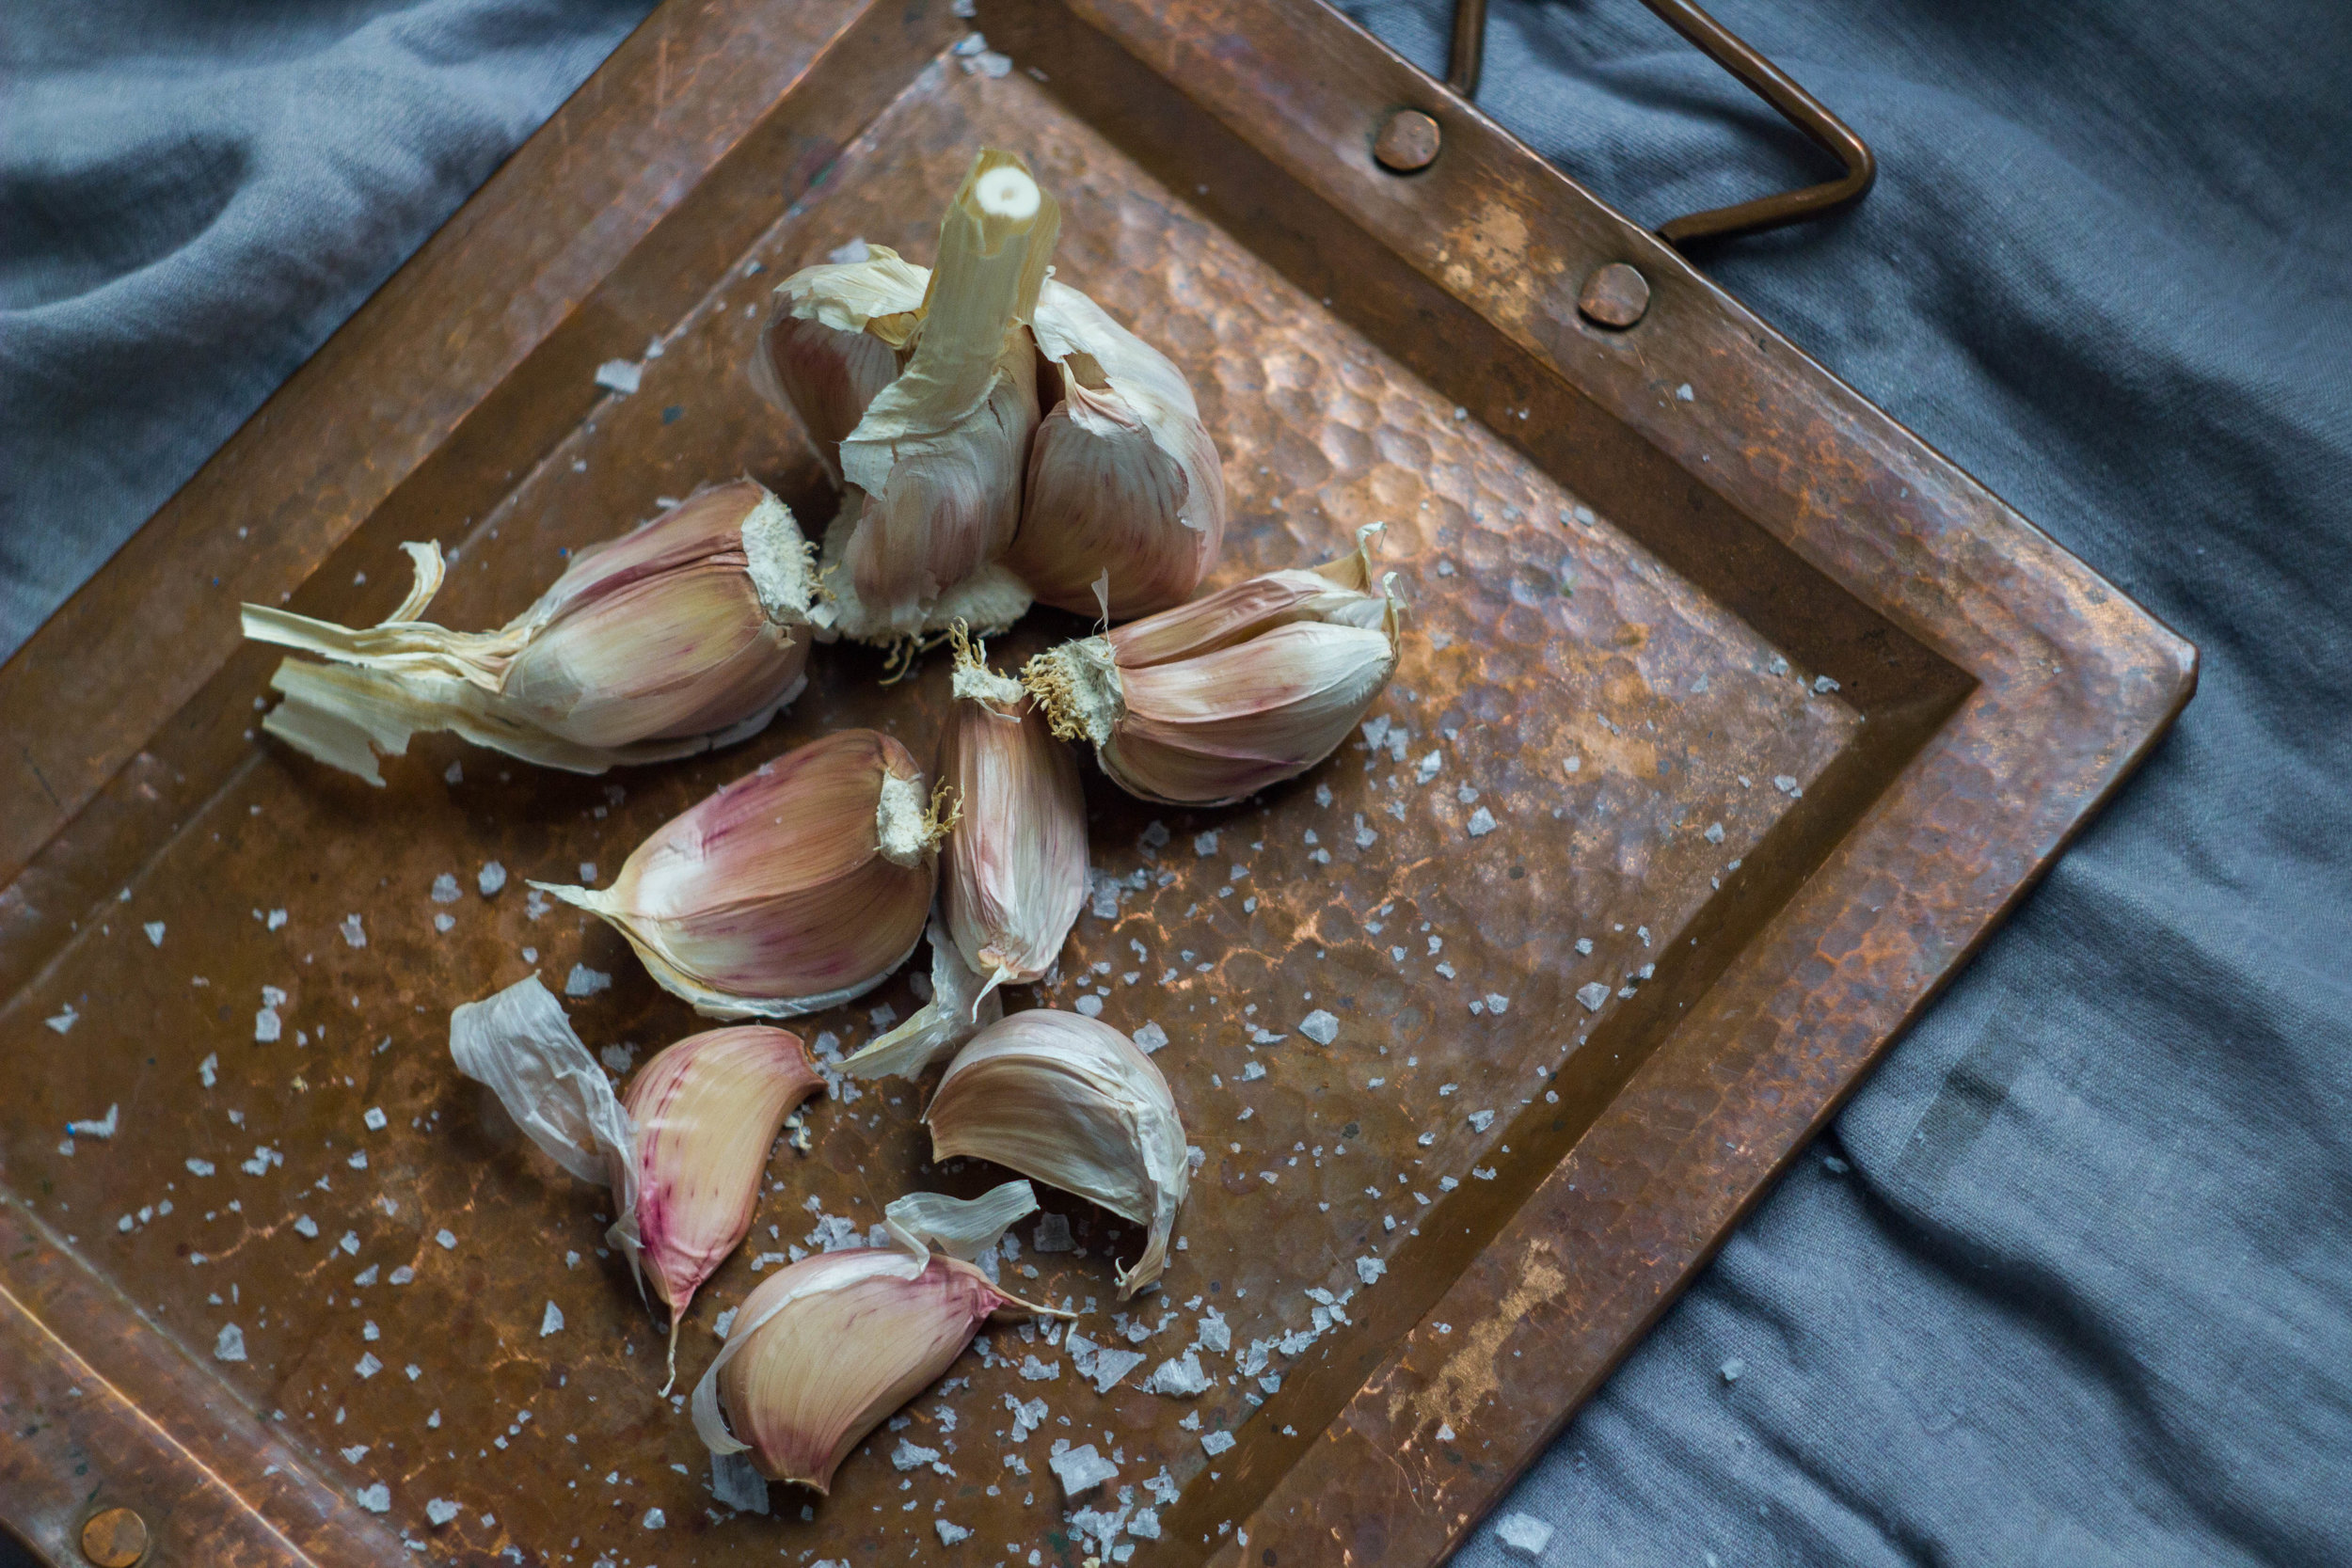 Raw: garlic bulb and cloves